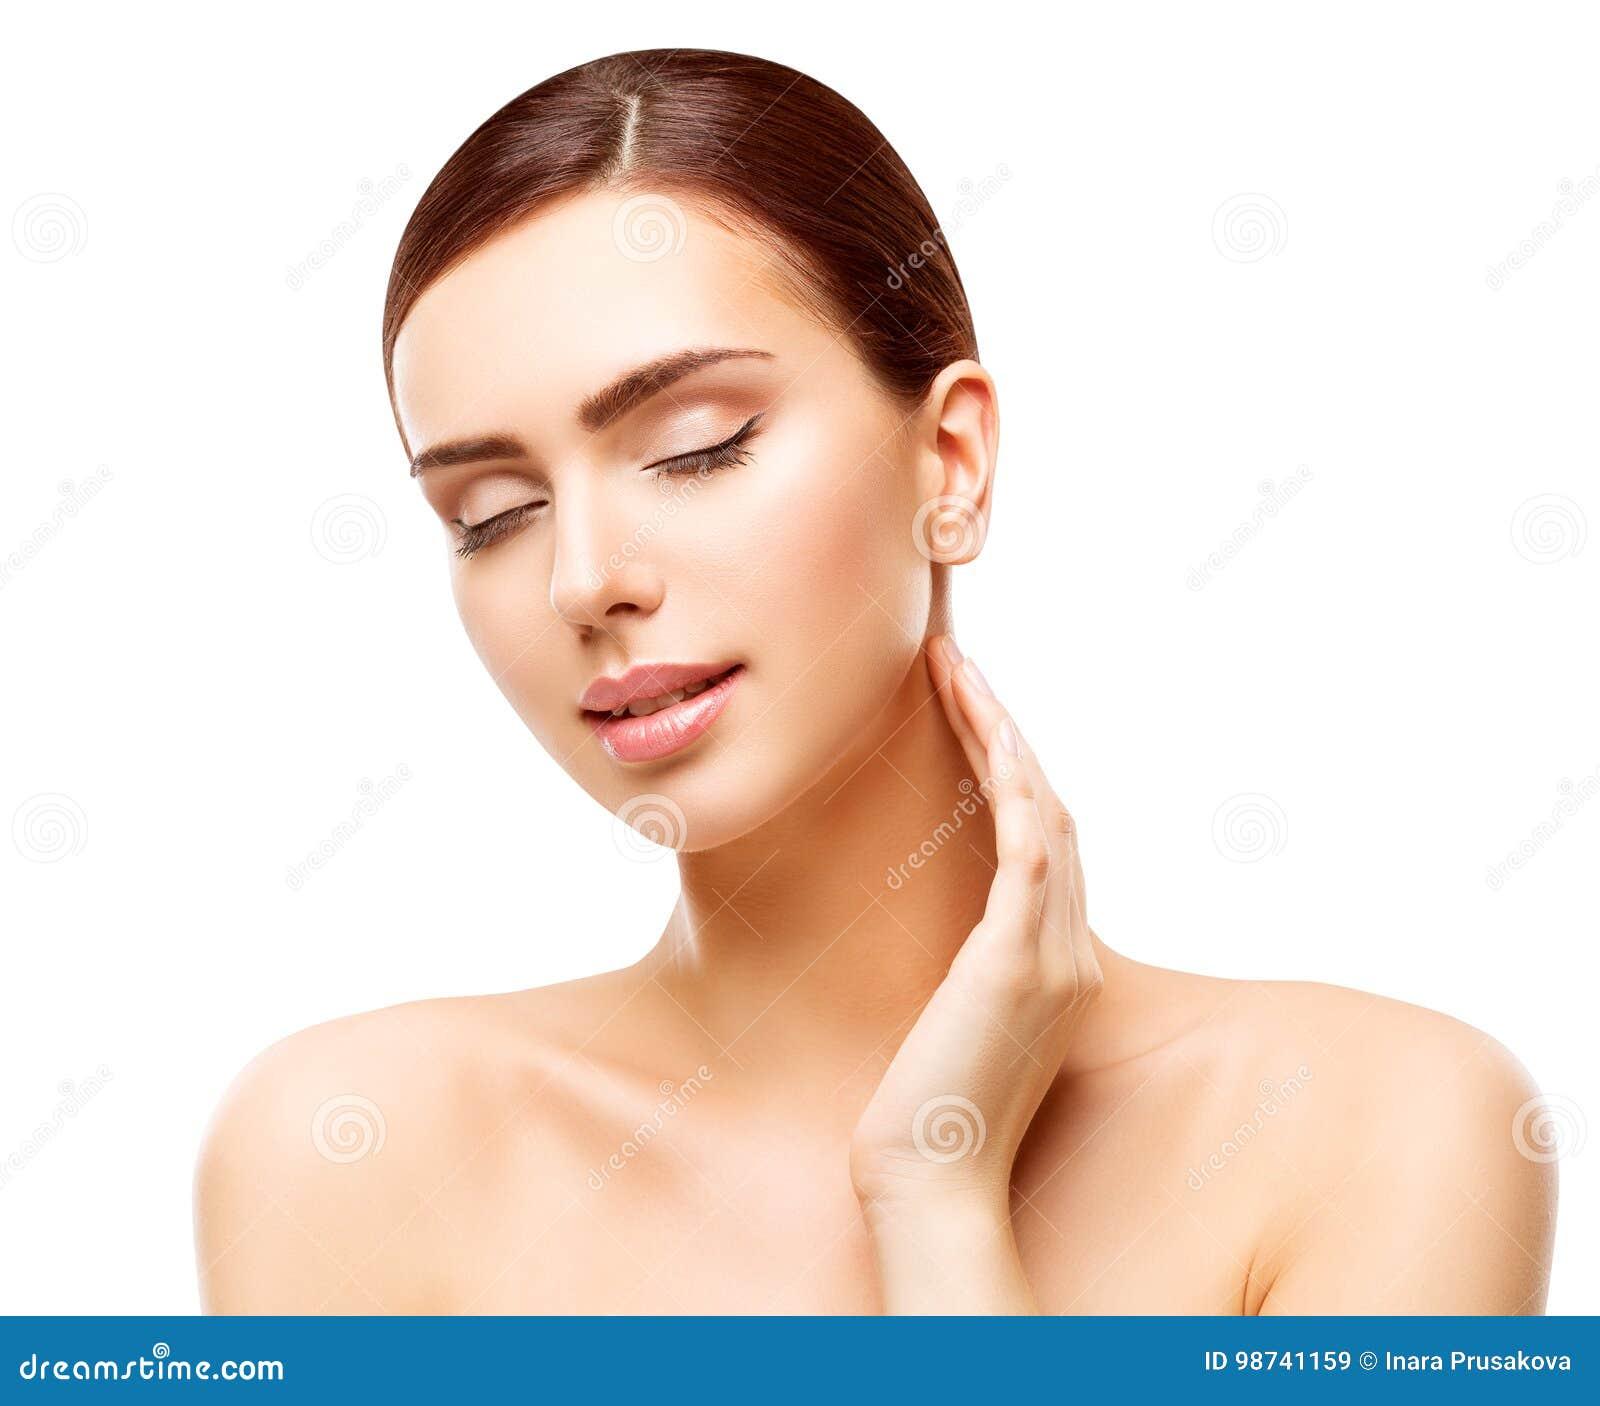 Woman Skin Care: Woman Beauty Face Skin Care, Natural Skincare Beautiful